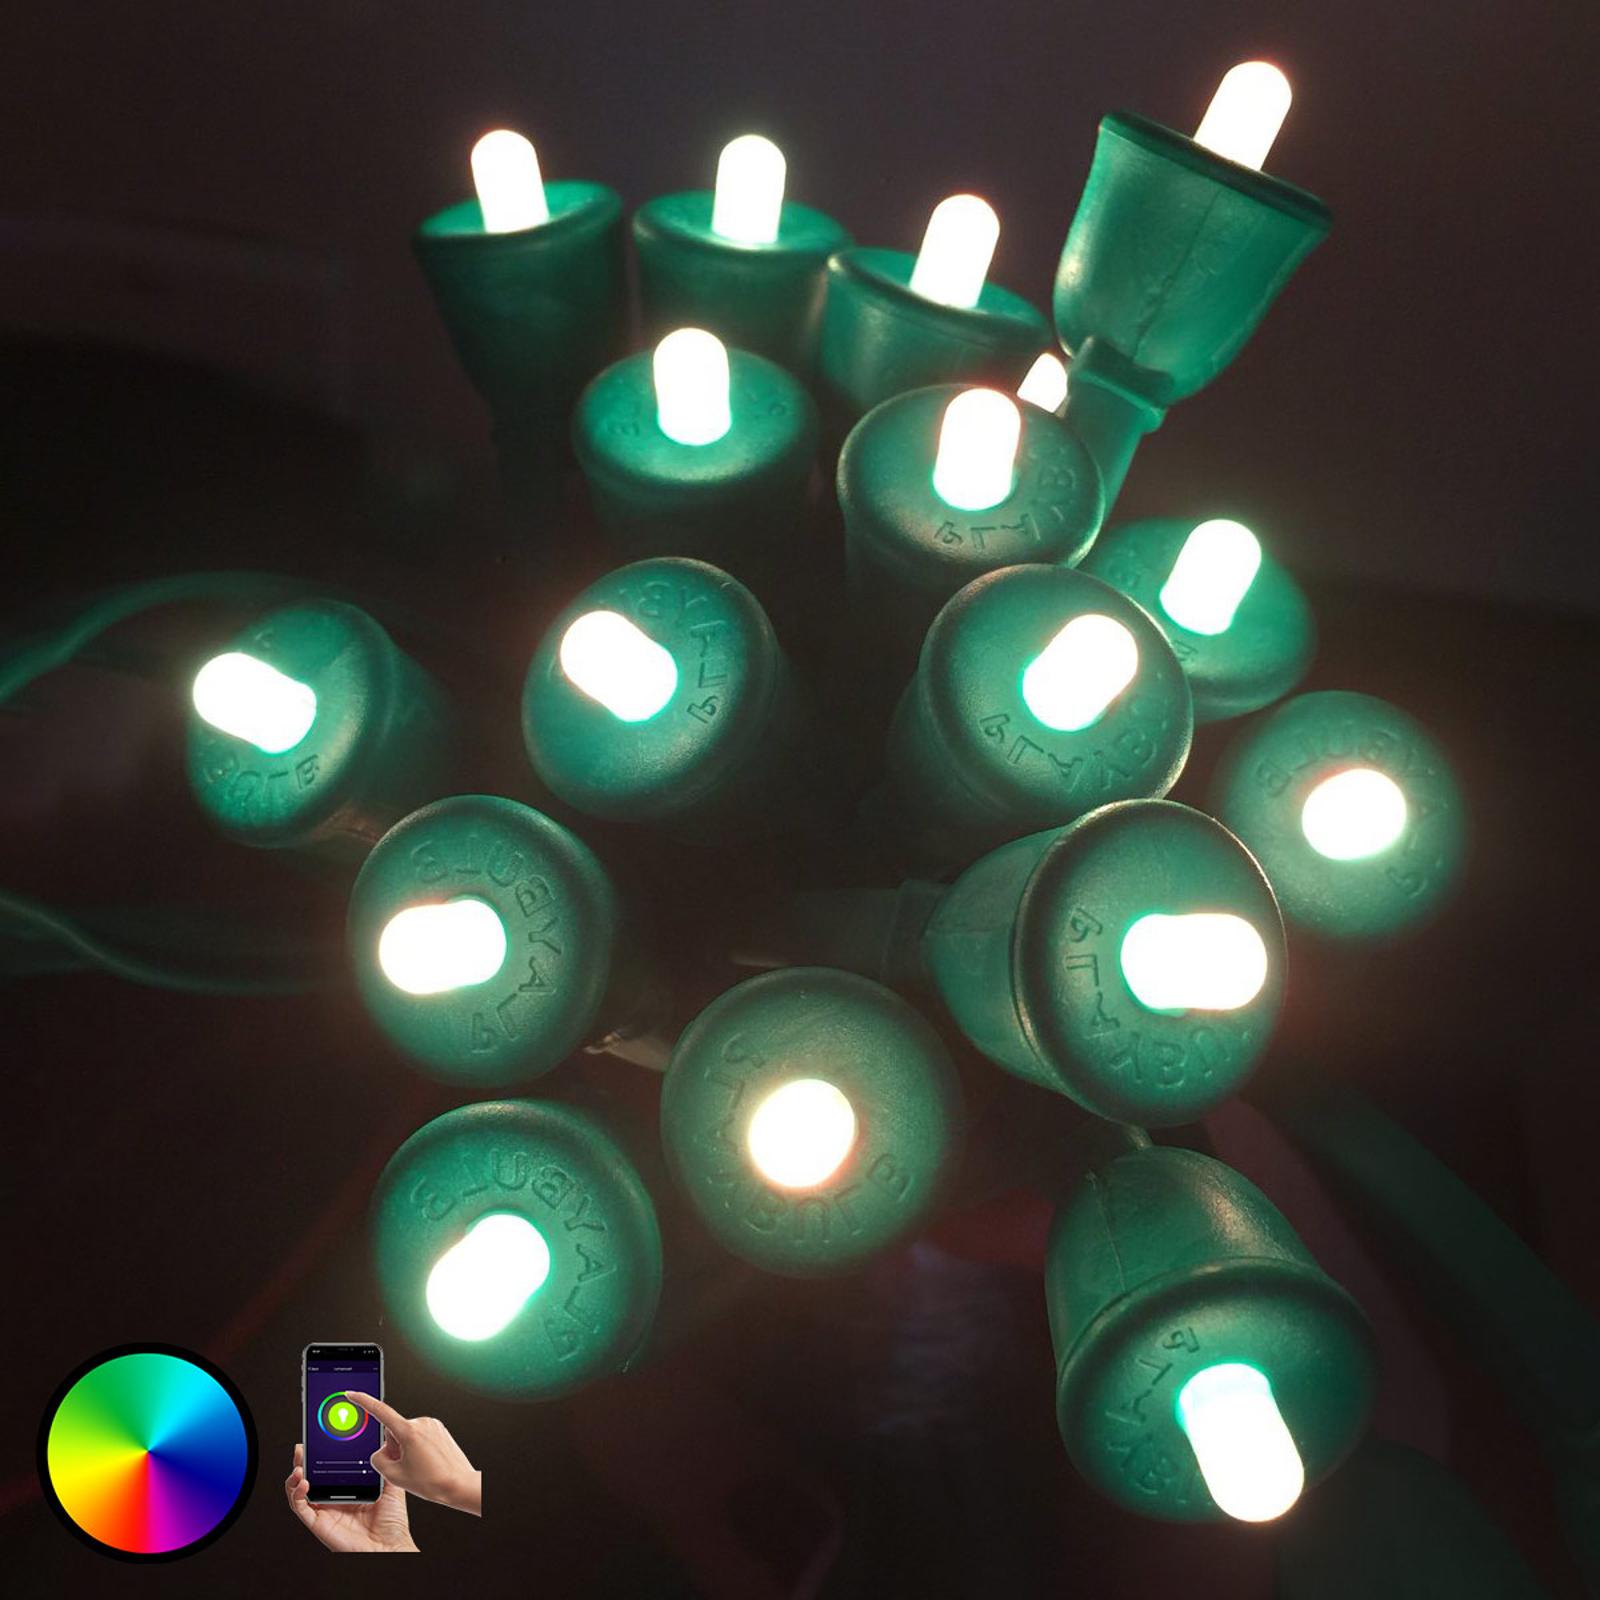 MiPow Playbulb String LED string lights 20m green_5543027_1